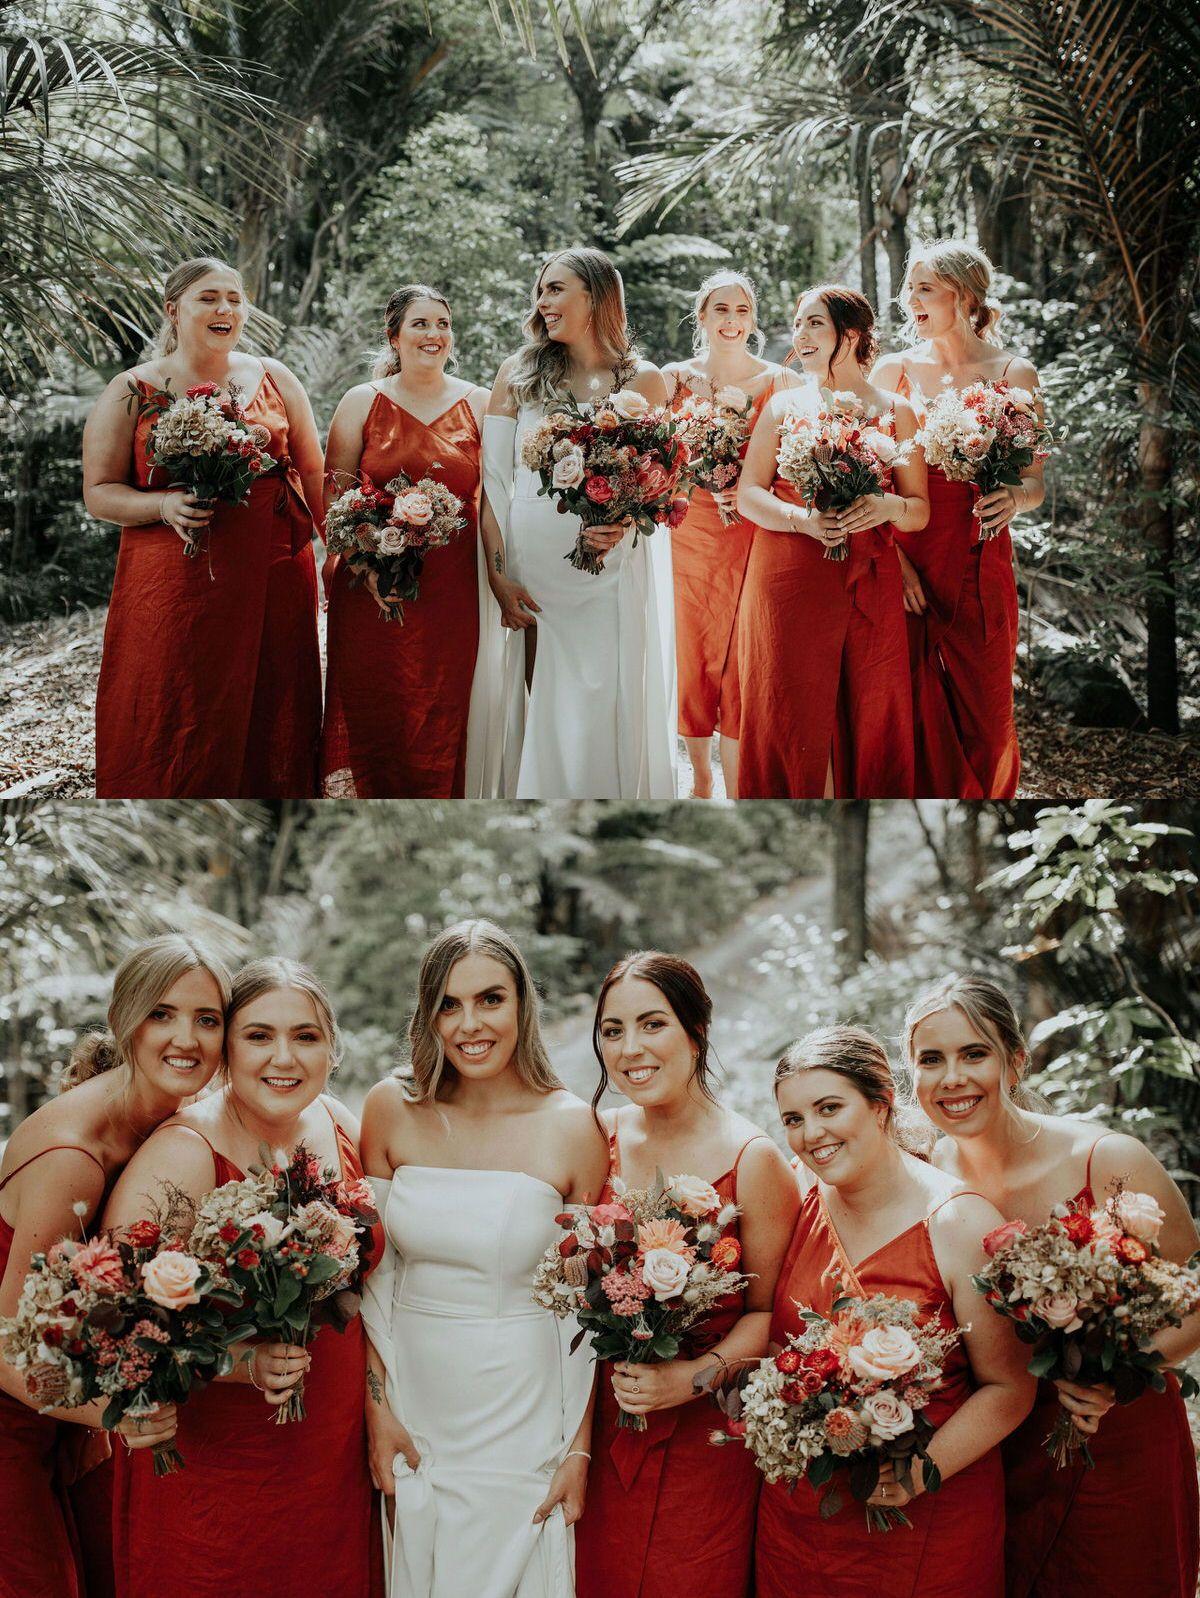 Bryce Brittany By Nikki Deles Together Journal Weddings Bridesmaid Dresses Australia Bridesmaid Dresses Maxi Dress Wedding [ 1598 x 1200 Pixel ]